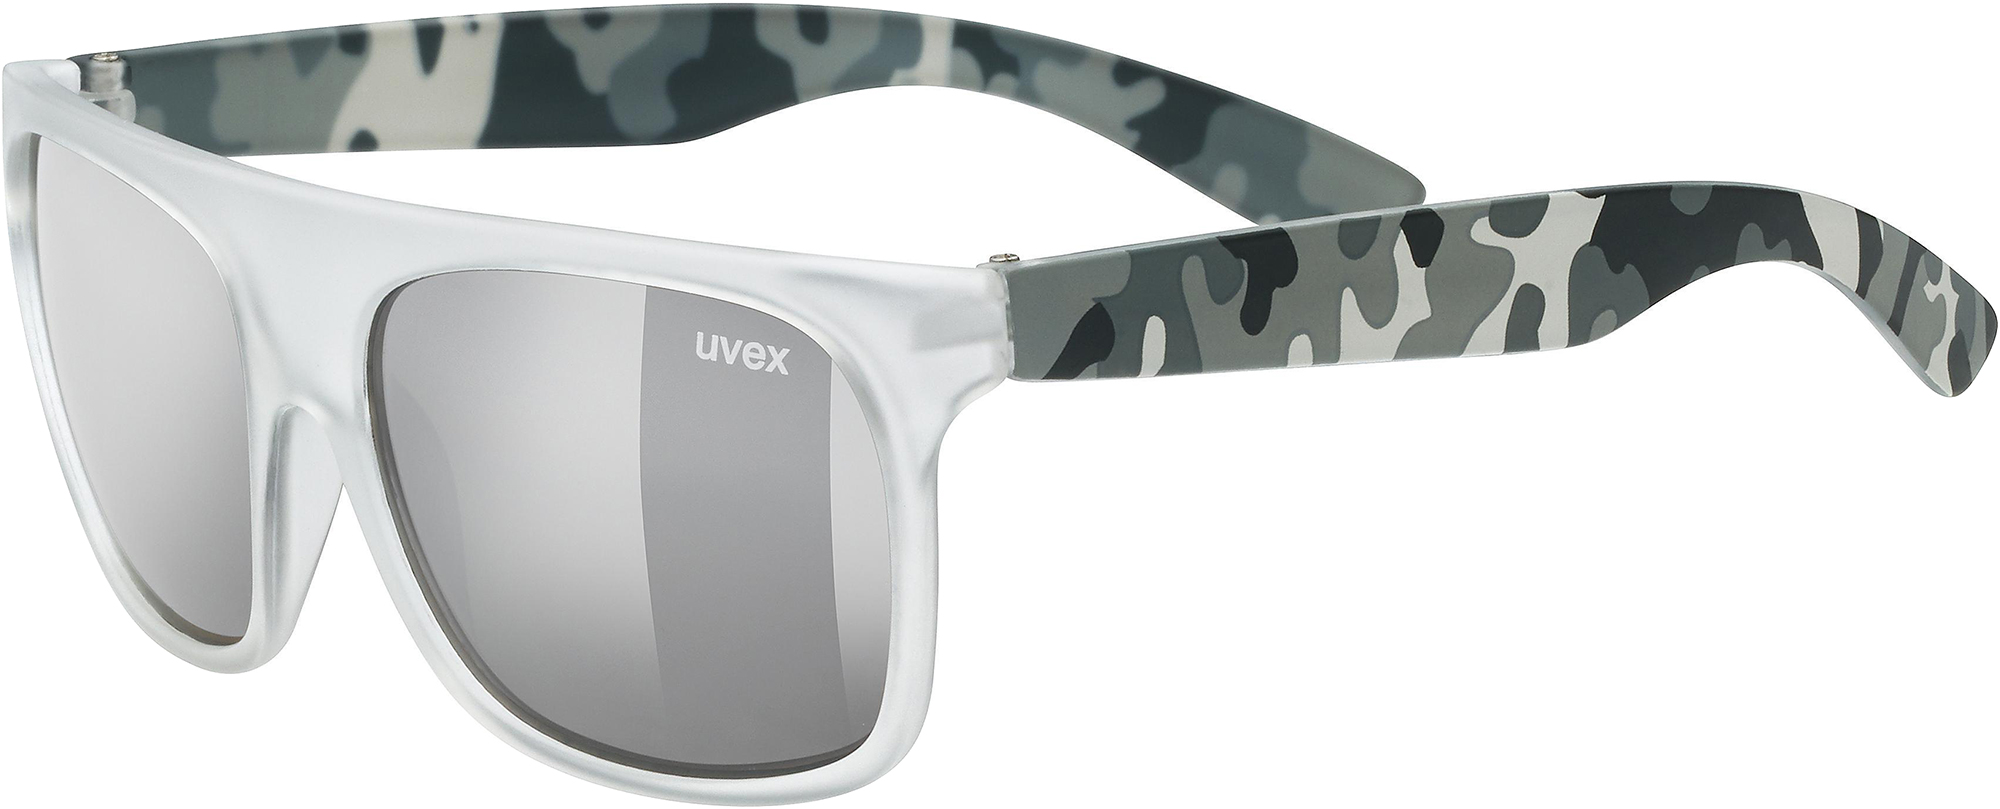 uvex шлем велосипедный uvex i vo c размер 52 56 Uvex Солнцезащитные очки детские Uvex Sportstyle 511